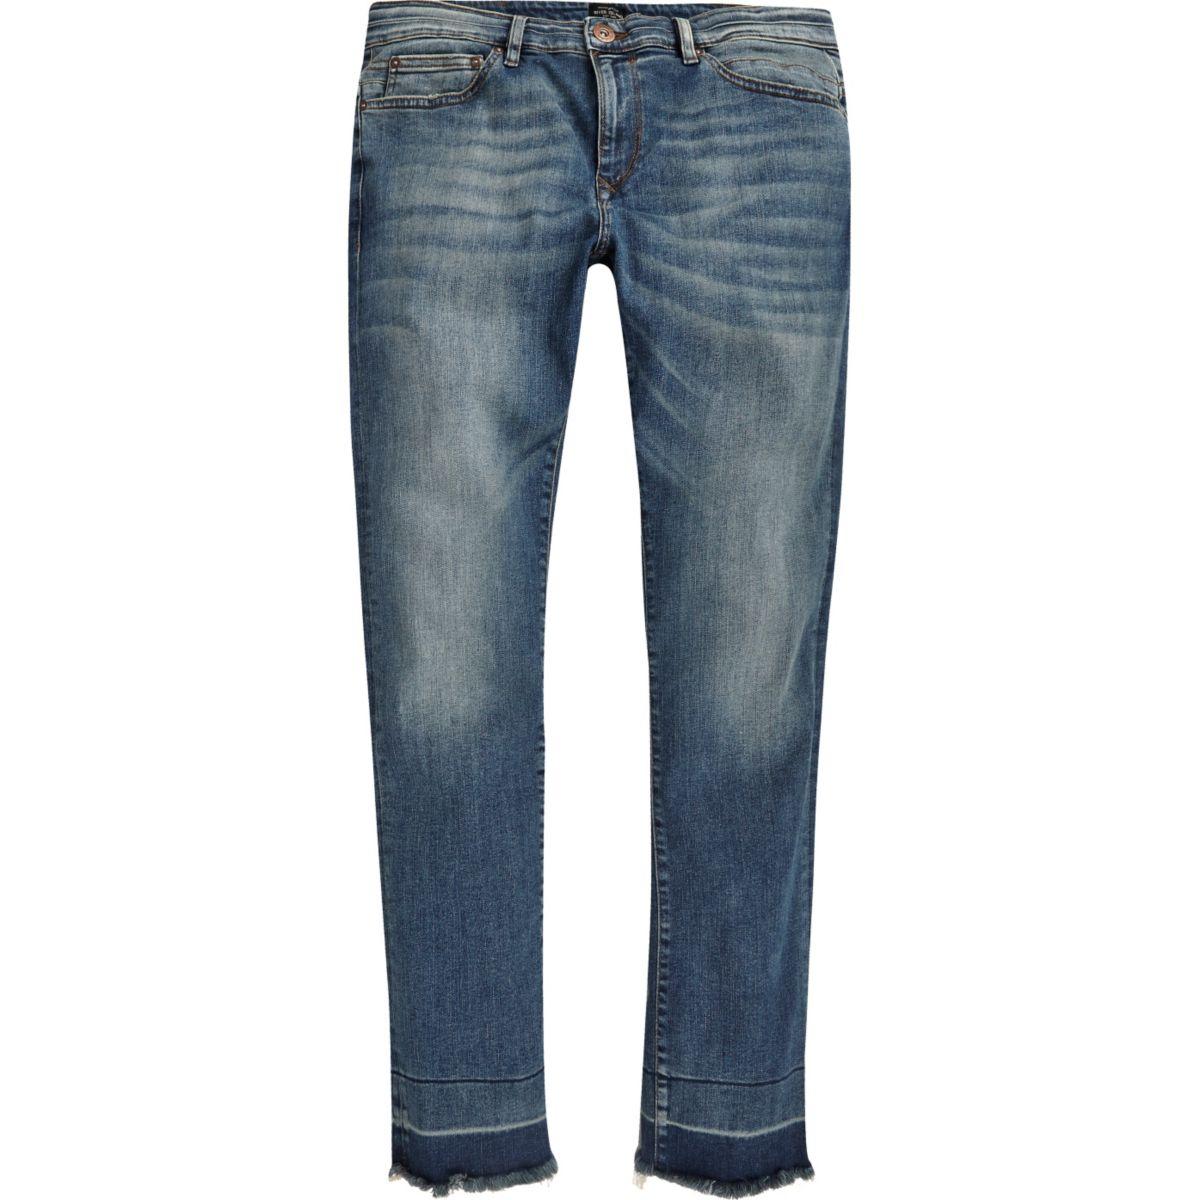 Blue wash Ronnie skinny cigarette jeans